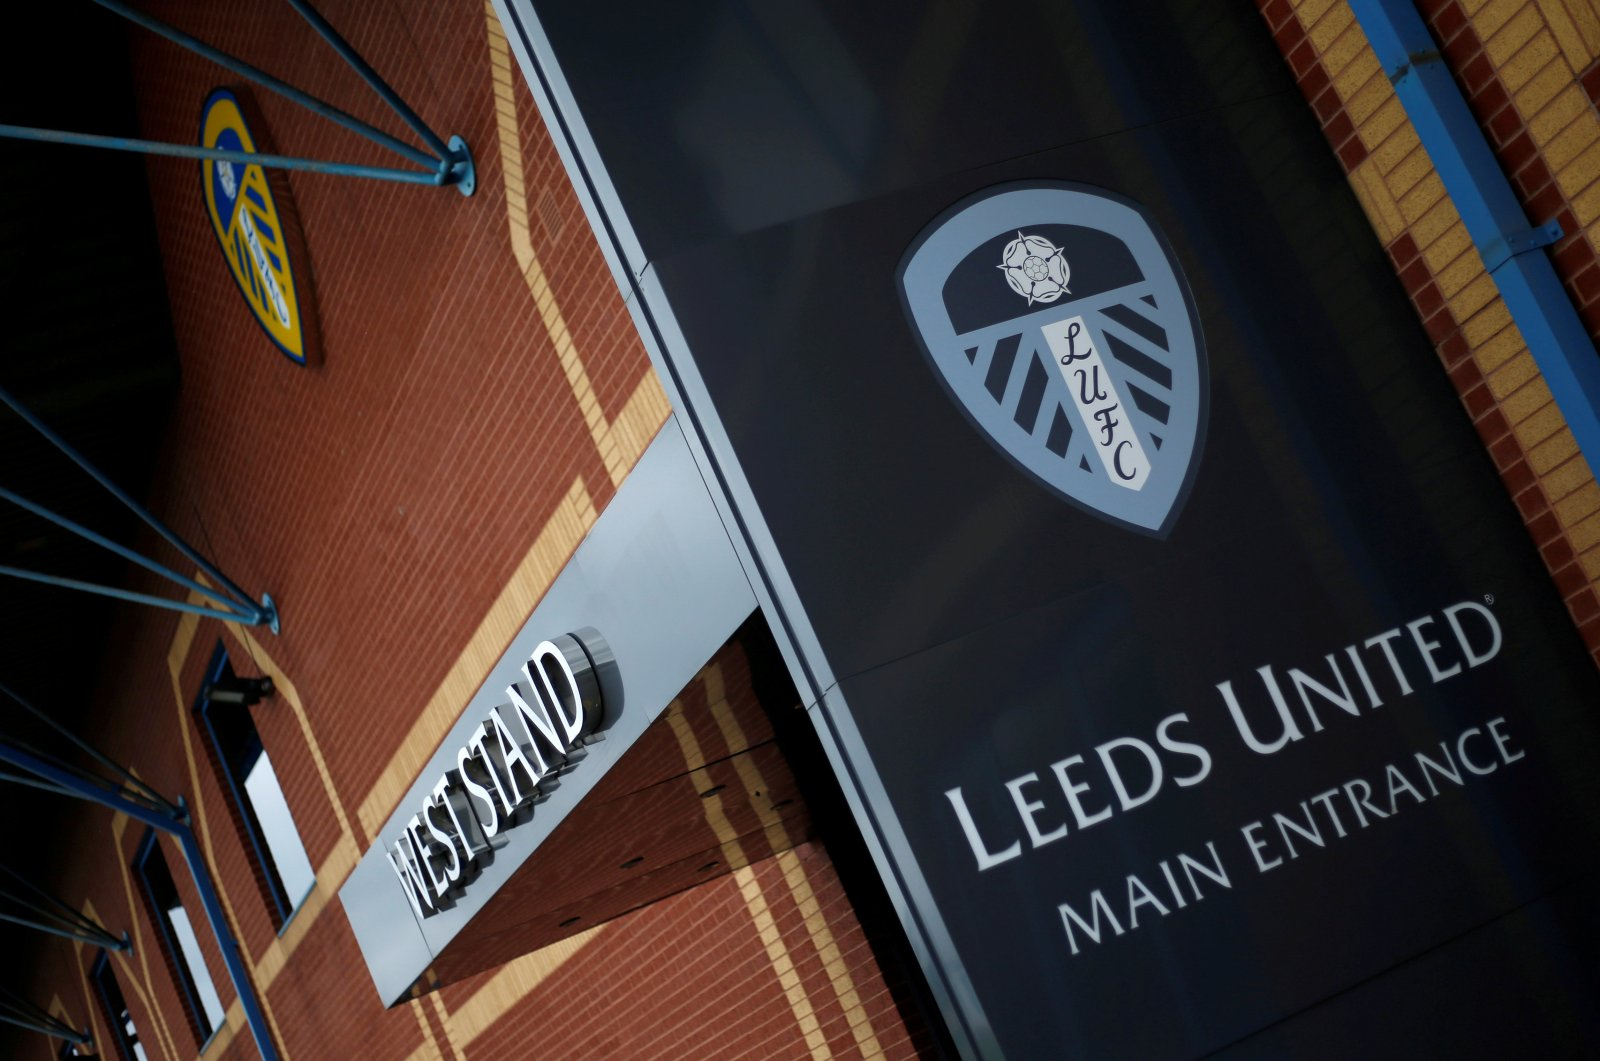 General view outside the Elland Road stadium, Leeds, Britain, Aug. 31, 2019. (Reuters Photo)